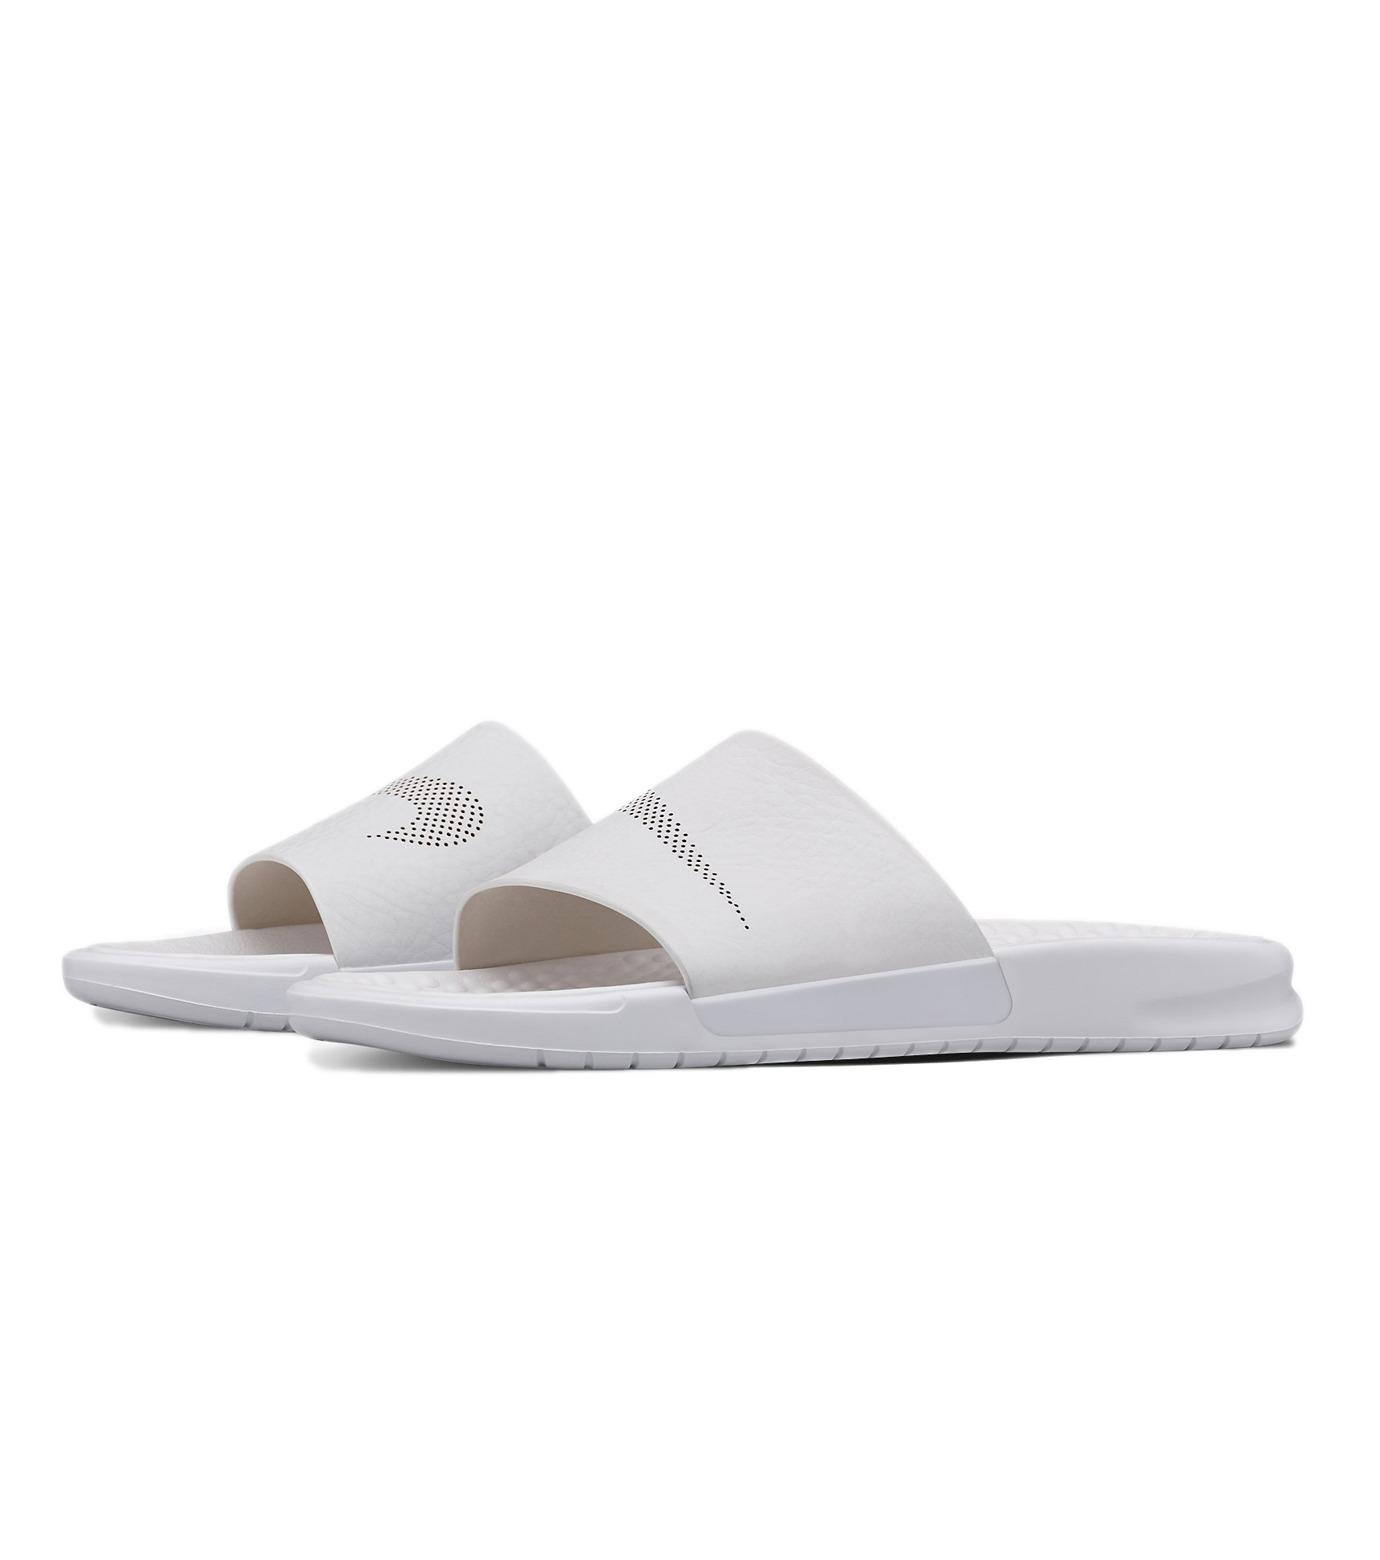 NIKE(ナイキ)のBenassi Slide Lux-WHITE(シューズ/shoes)-818742-100-4 拡大詳細画像3